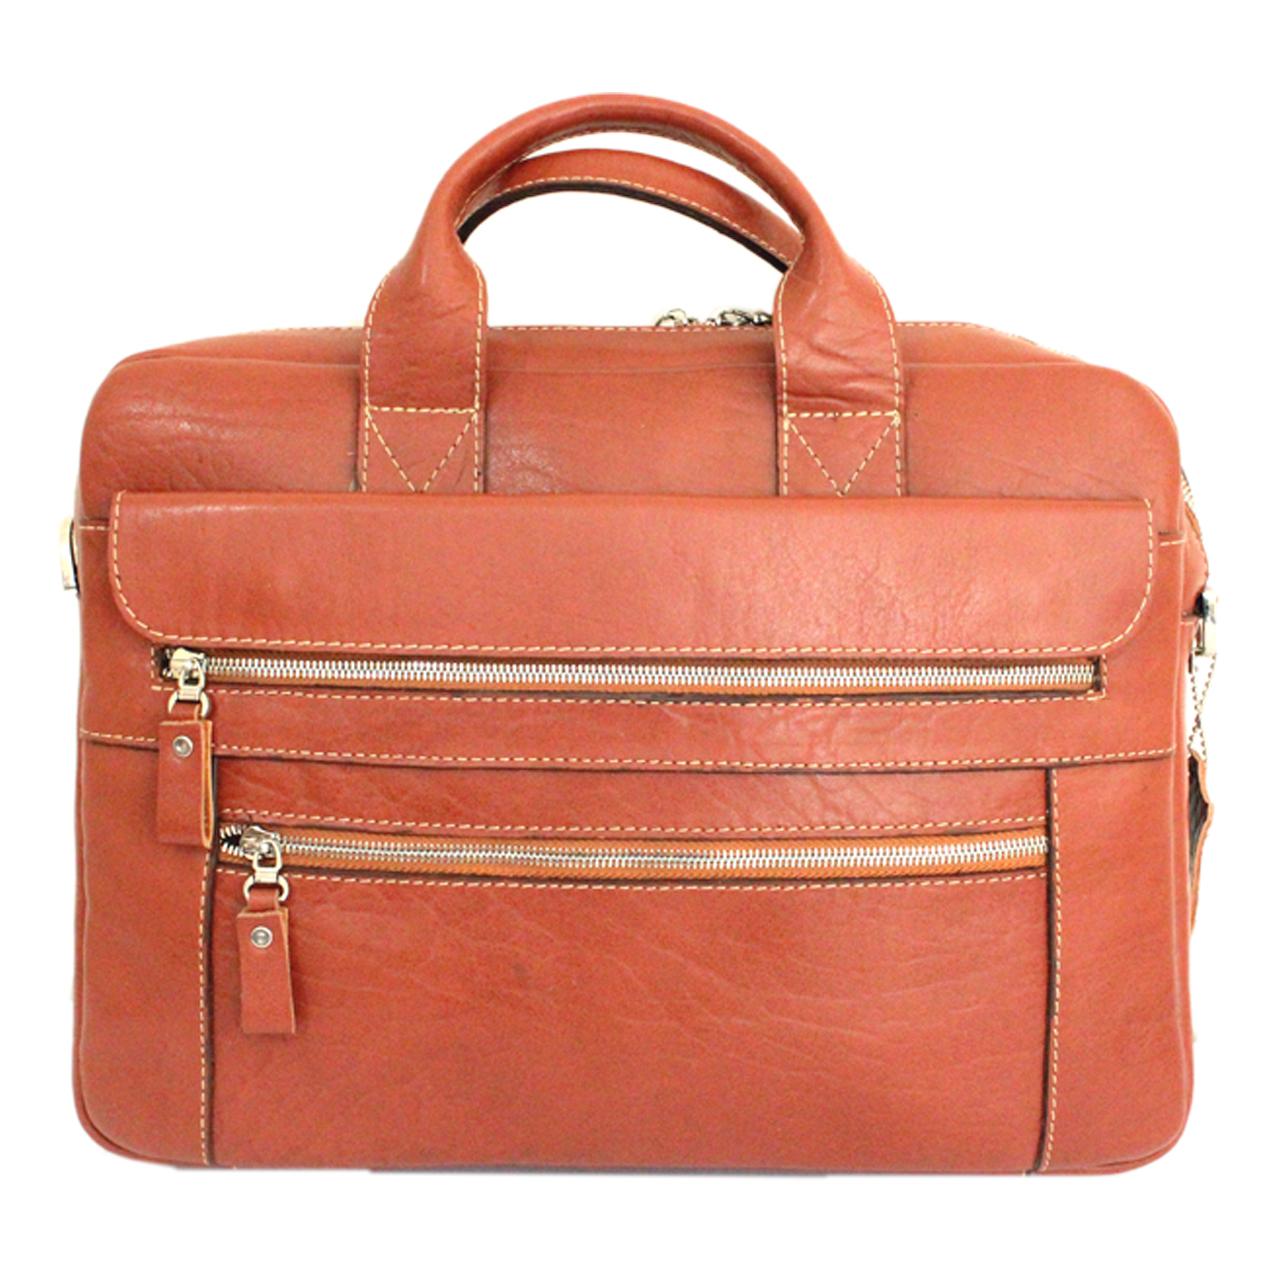 کیف اداری چرم مردانه چرم آرا مدل e070